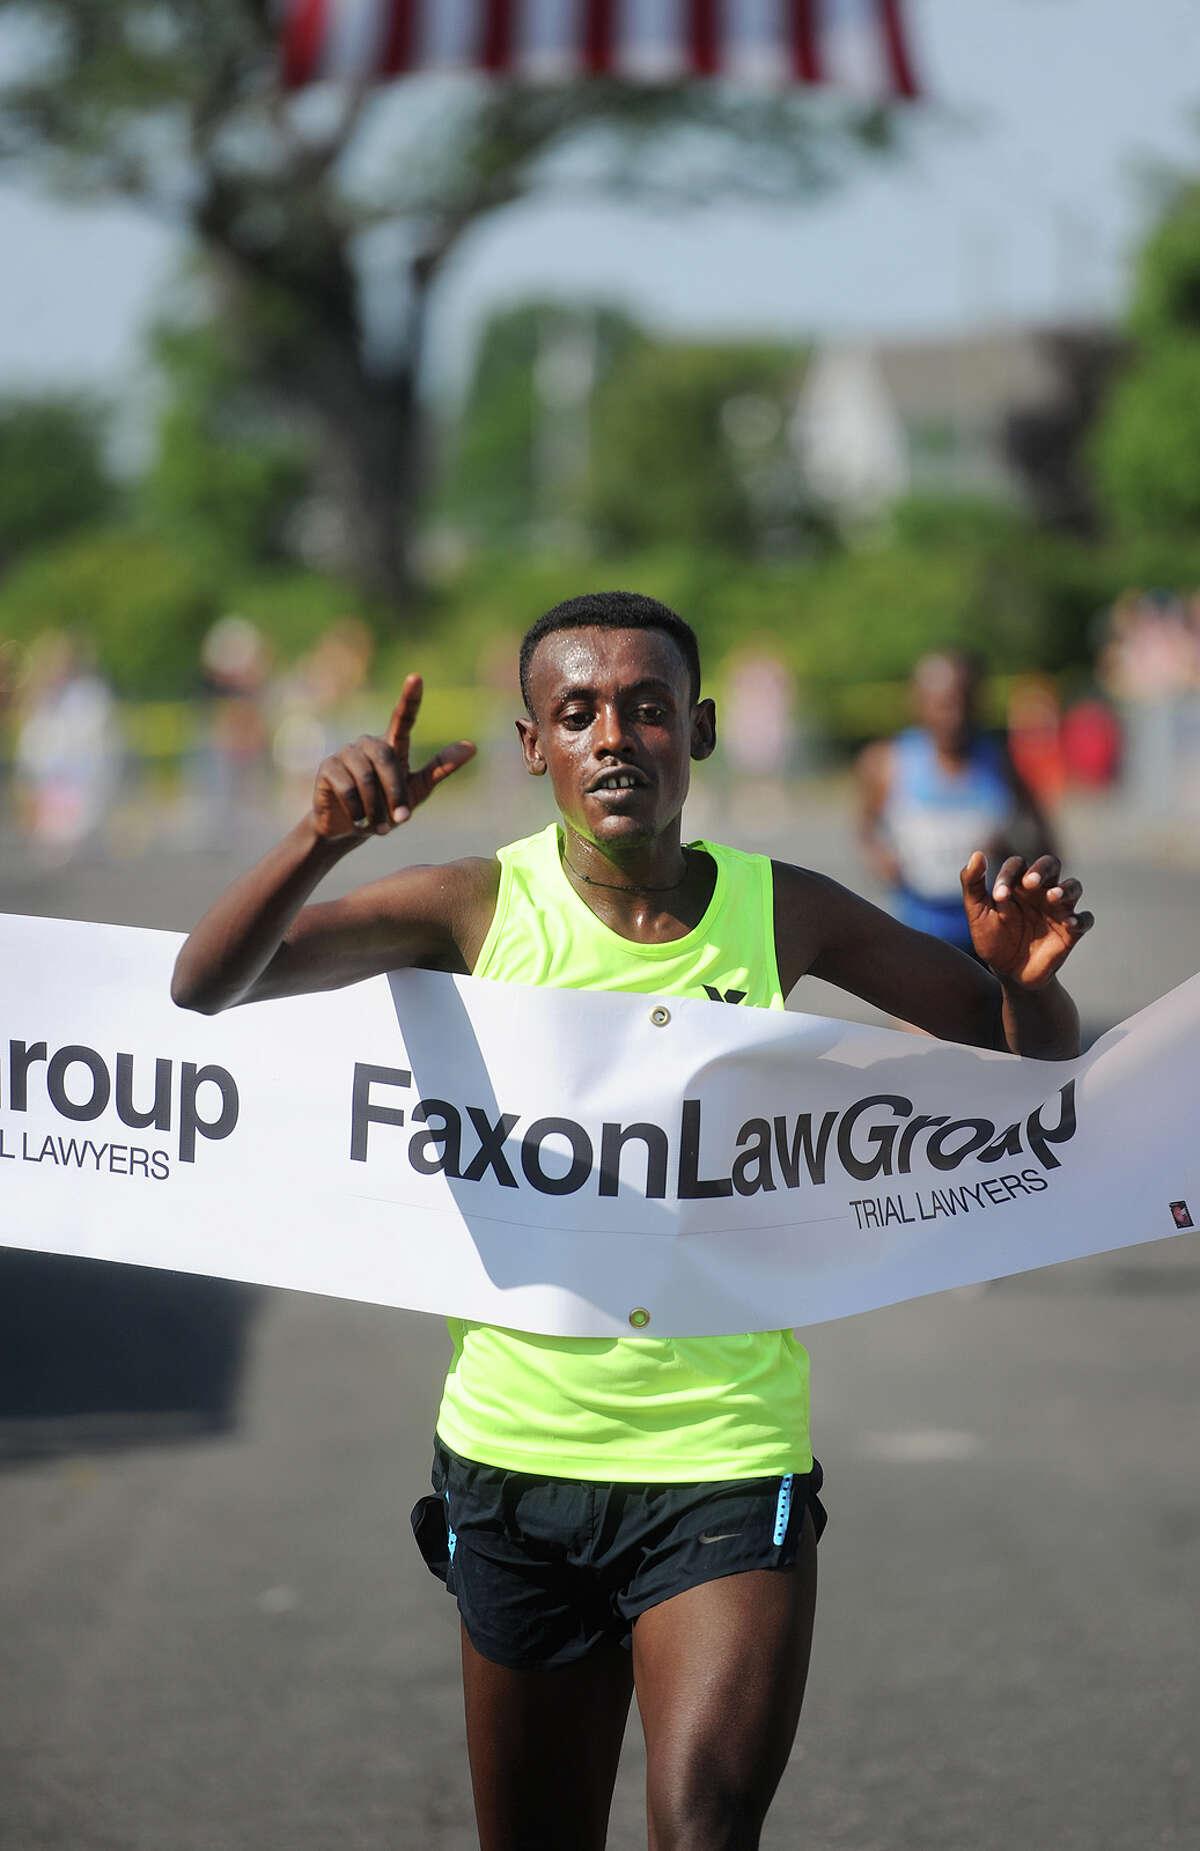 Ethiopian Tsegaye Getachw breaks the tape to win the 2016 Faxon Law Fairfield Half Marathon in Fairfield, Conn. on Sunday, June 26, 2016.